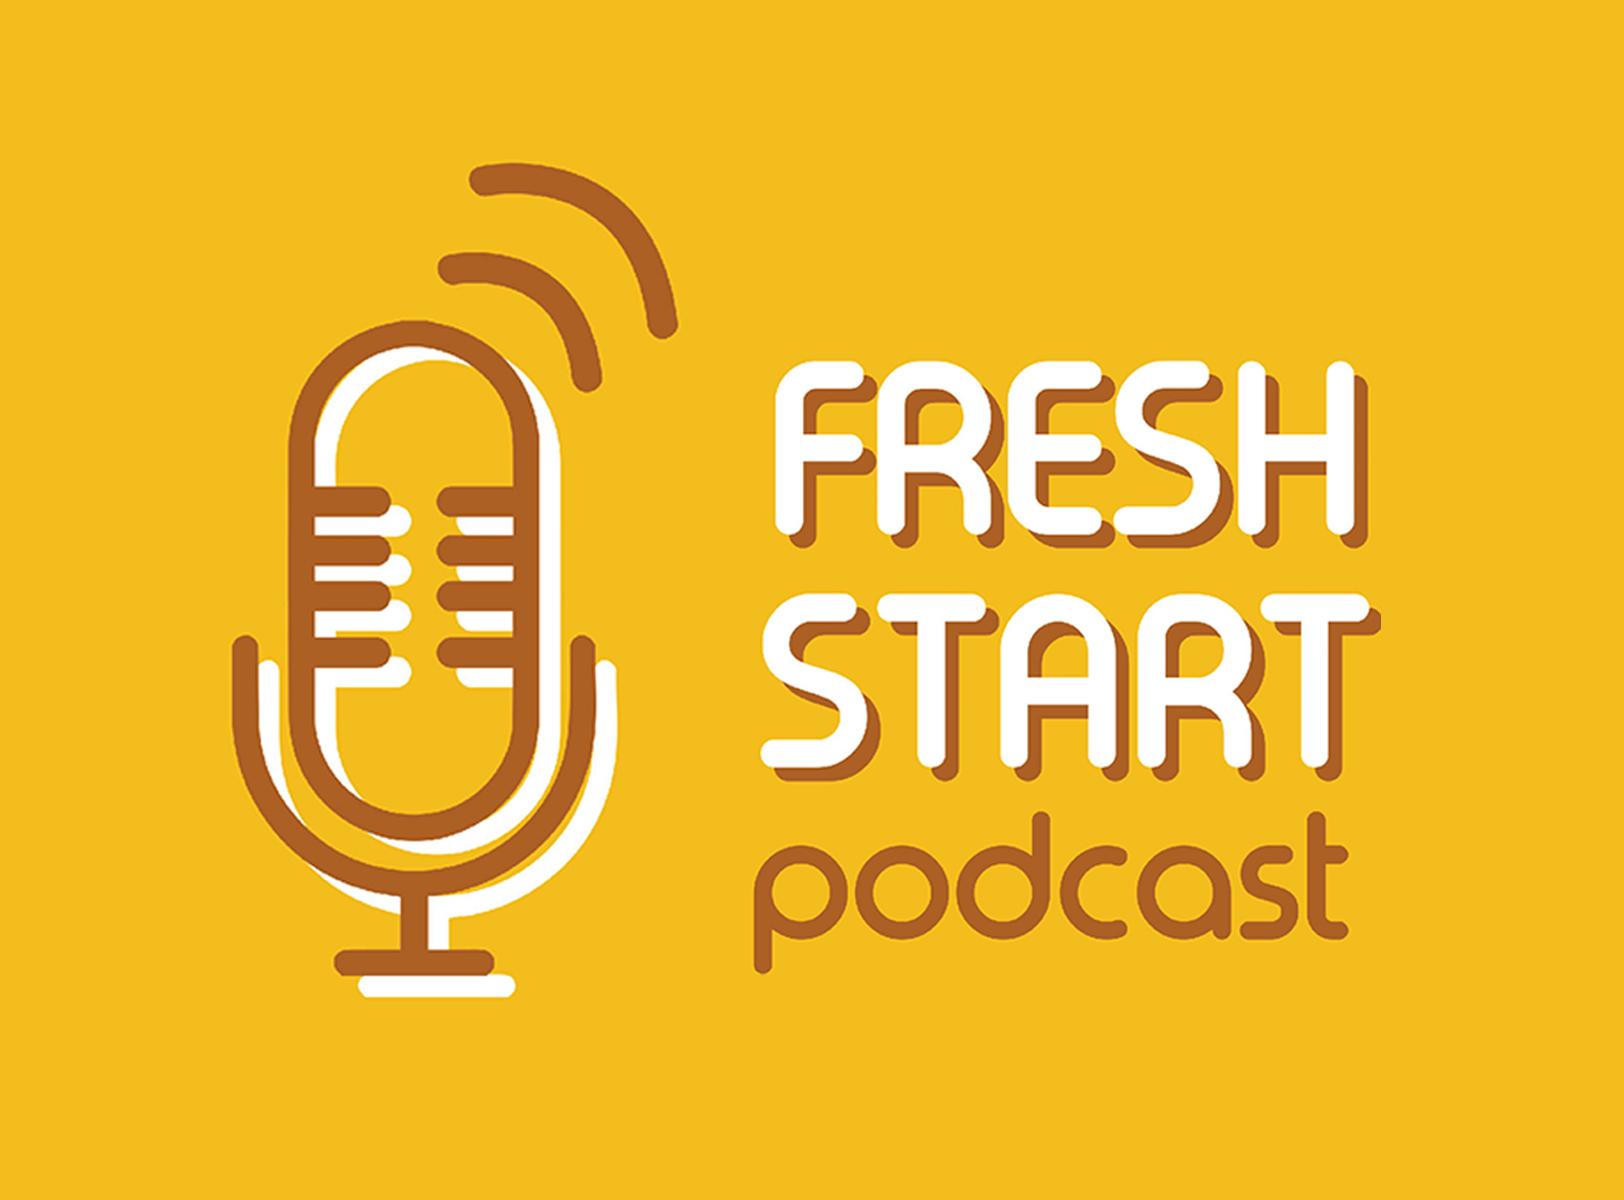 Fresh Start: Podcast News (4/9/2019 Tue.)